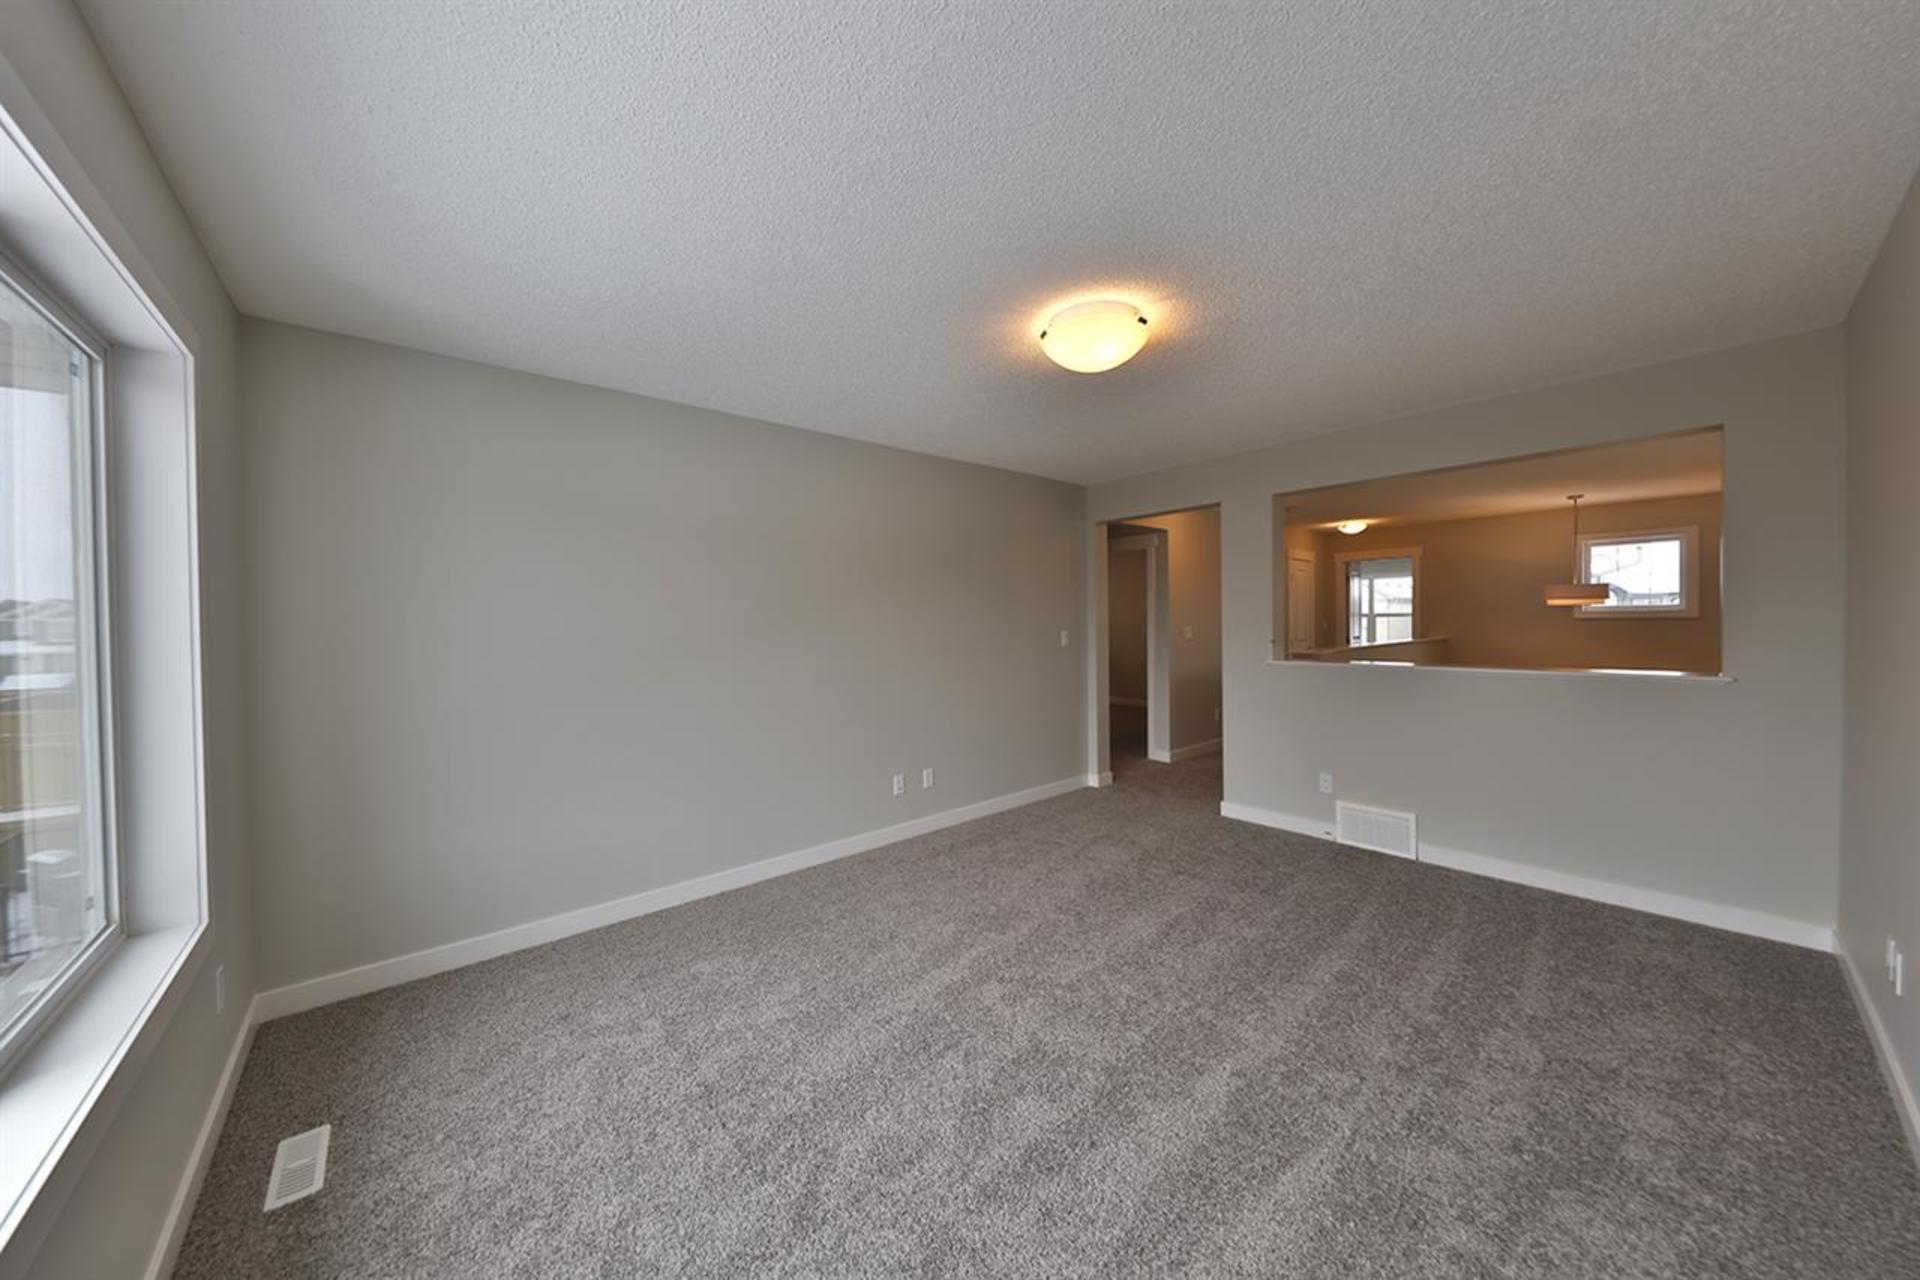 17550-60a-street-mcconachie-area-edmonton-21 at 17550 60a Street, McConachie Area, Edmonton